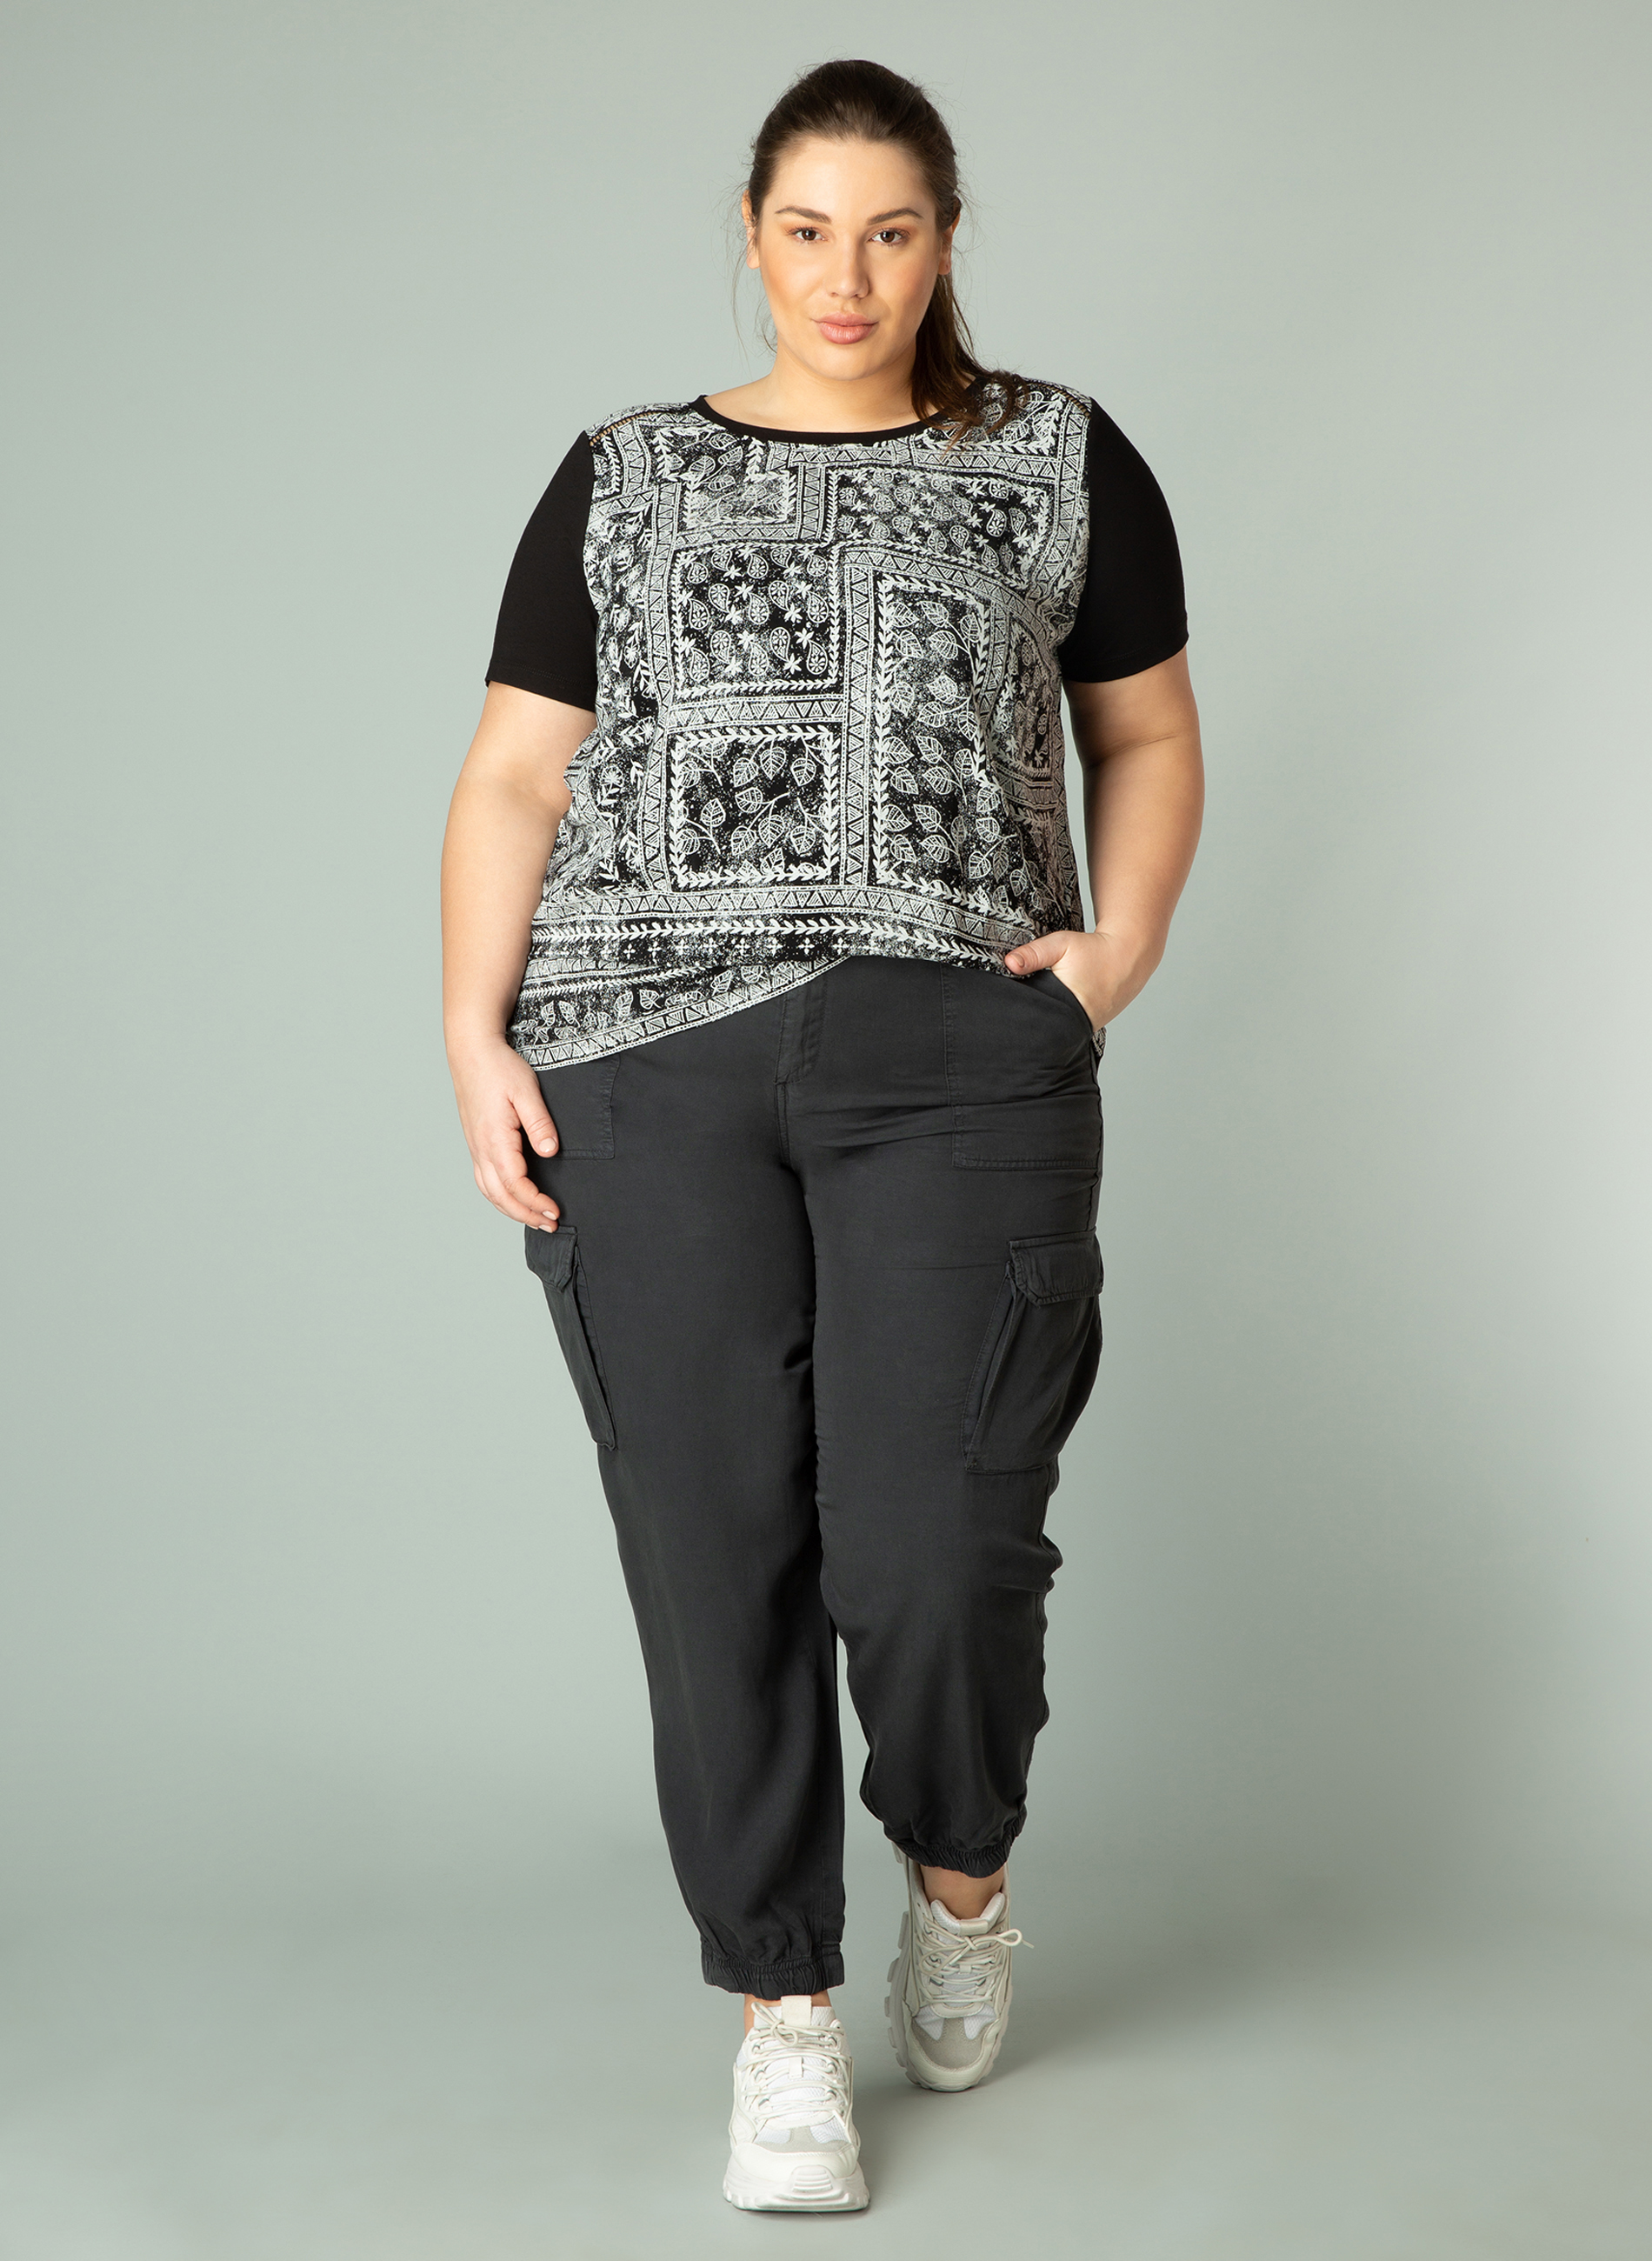 Yest Shirt Ghislainy 64 cm